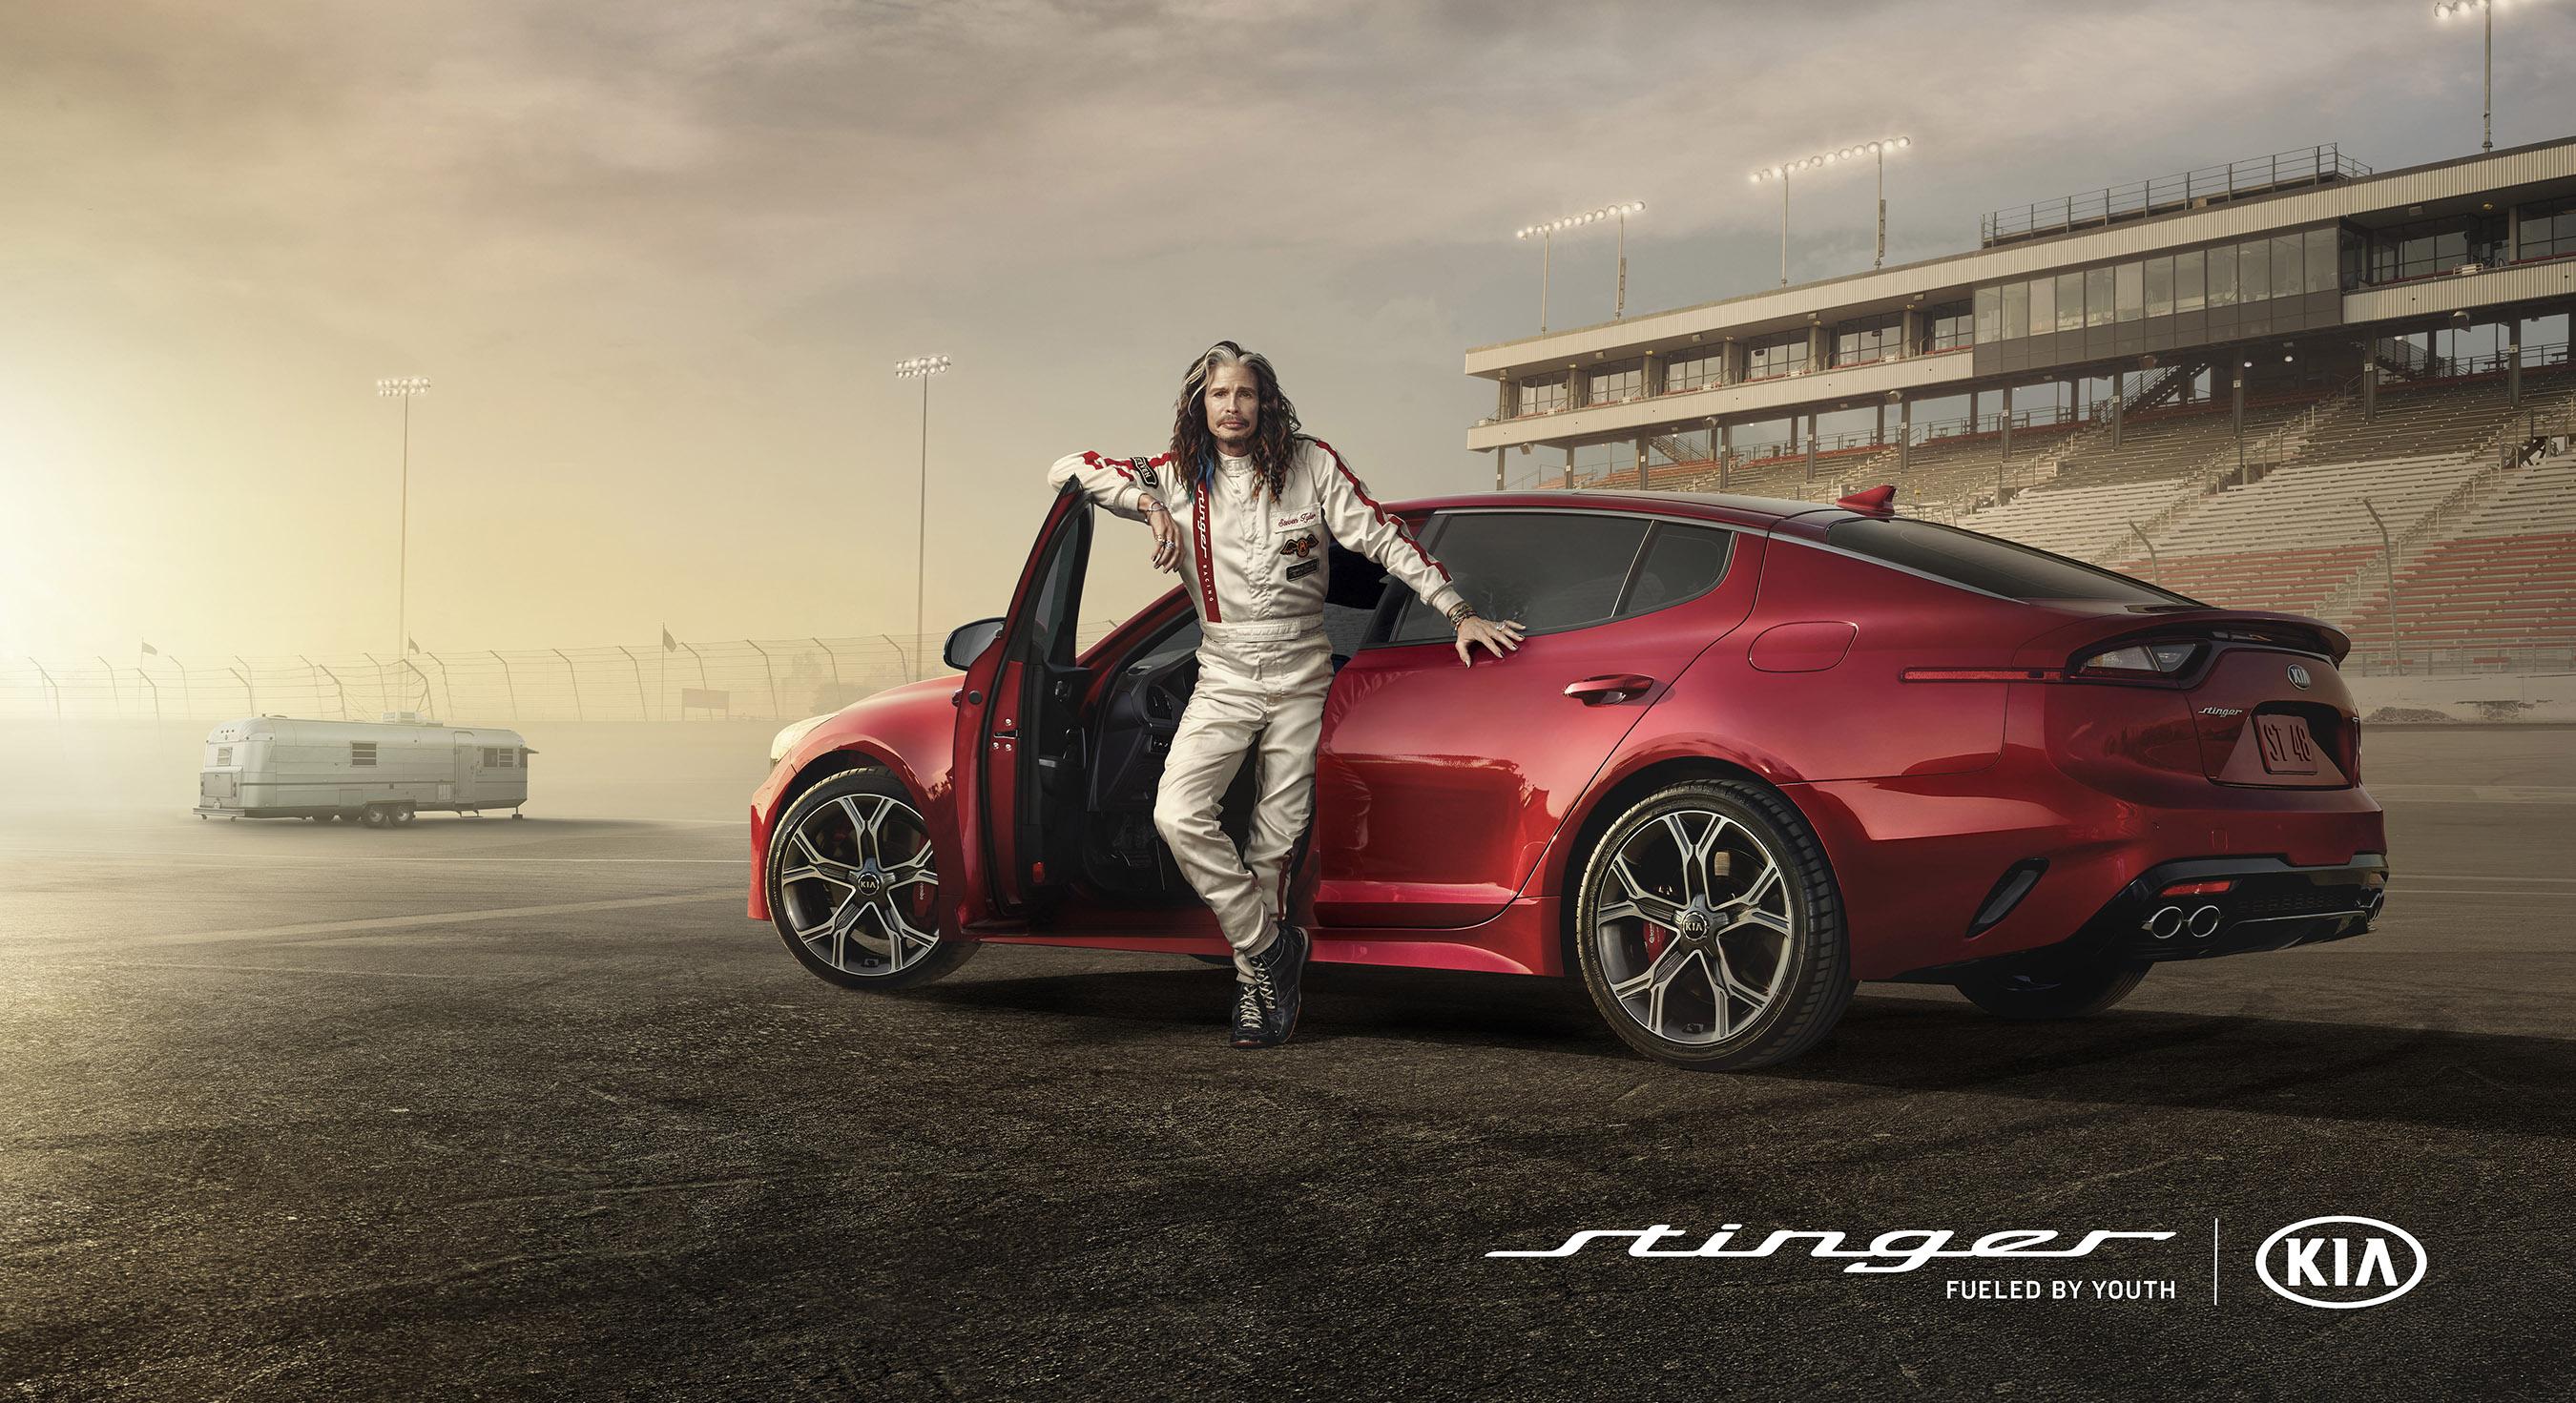 stinger cars coupe car top speed kia sports